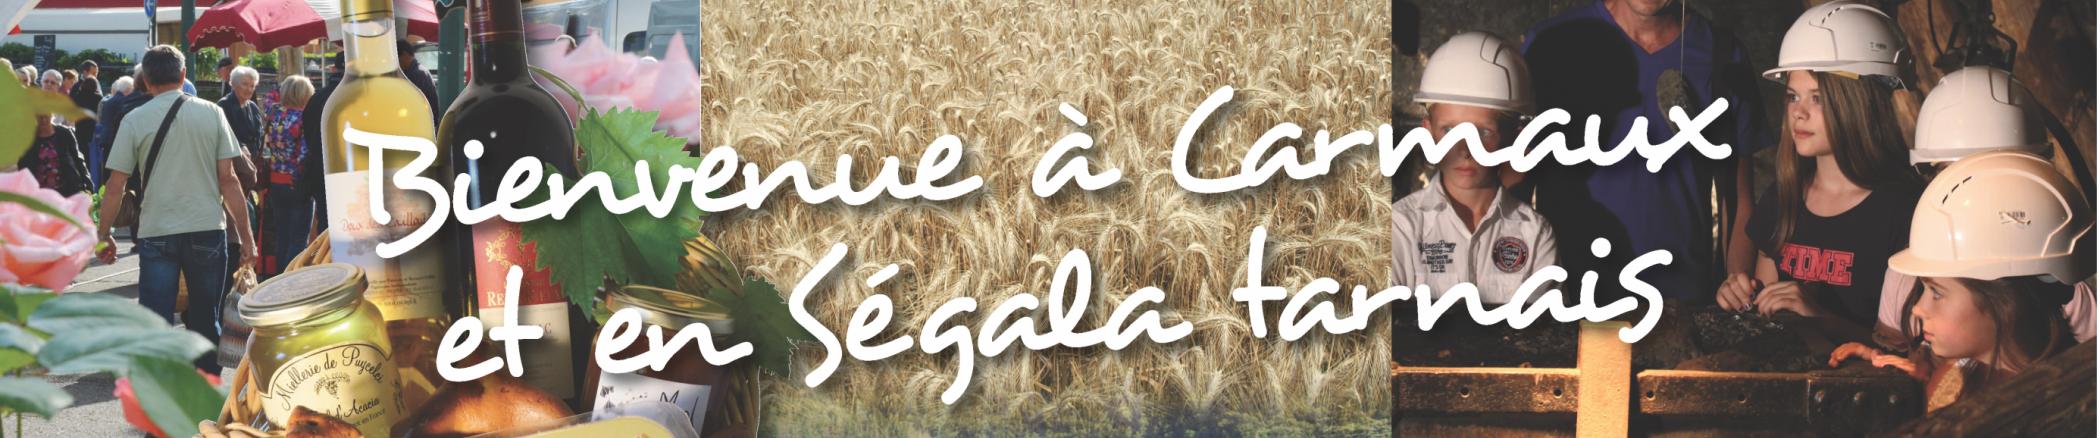 Le Carmausin Ségala, un territoire touristique